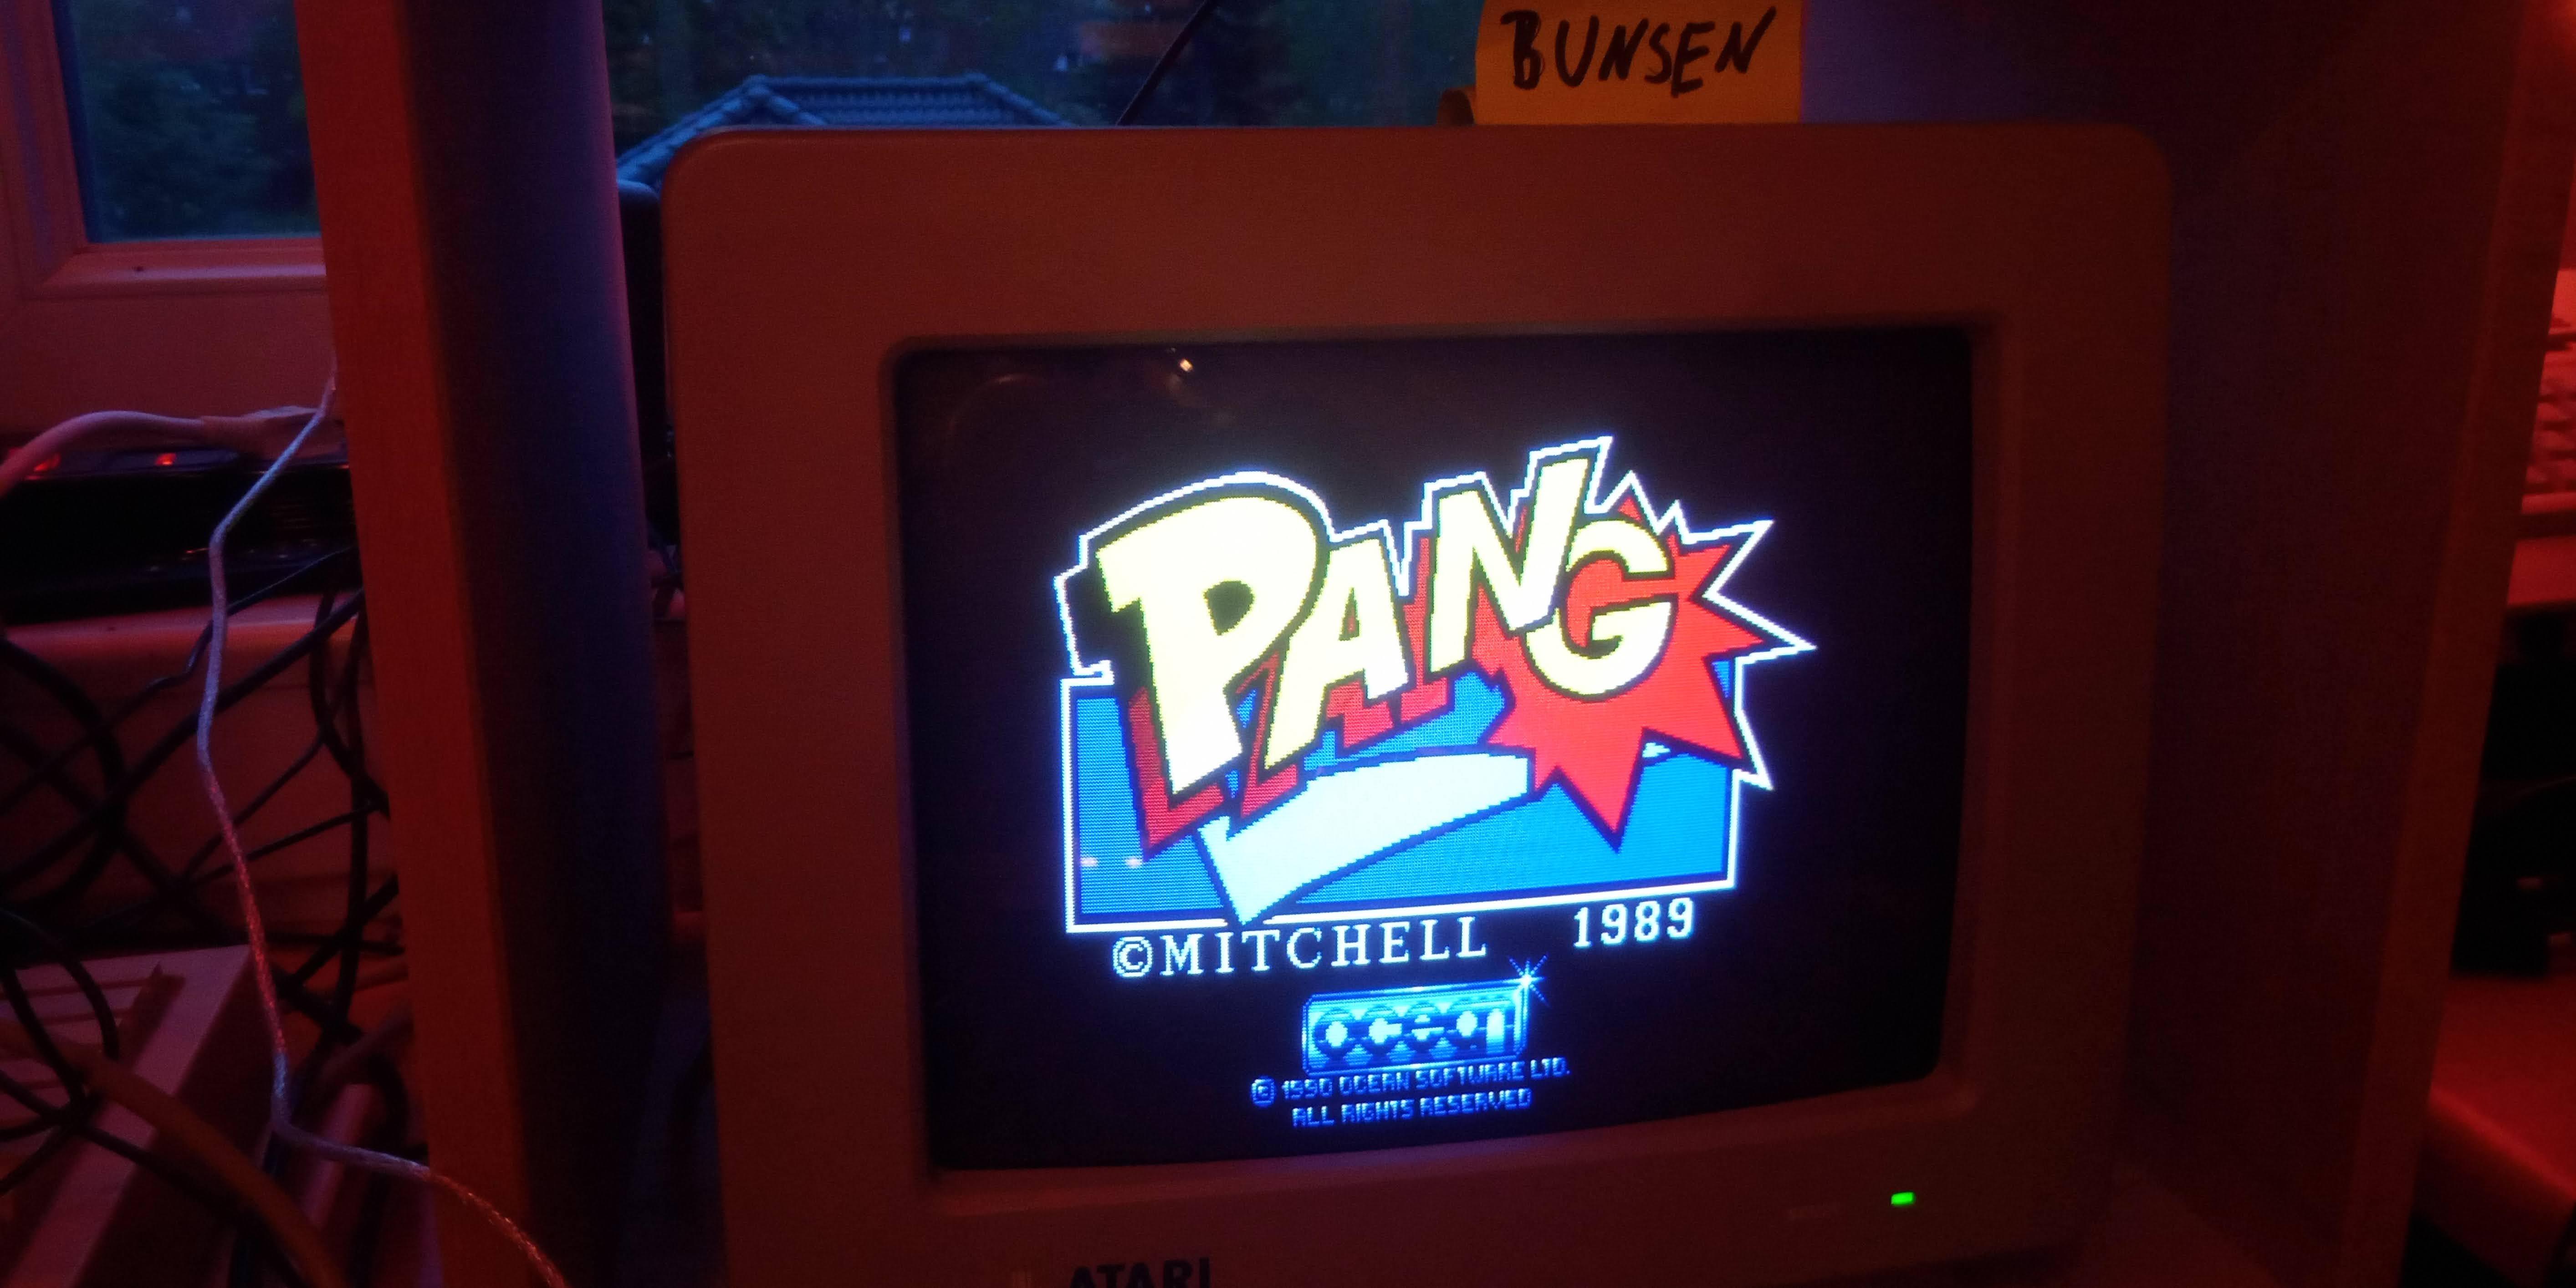 Bunsen: Pang [Easy] (Atari ST) 112,300 points on 2021-05-24 14:42:46